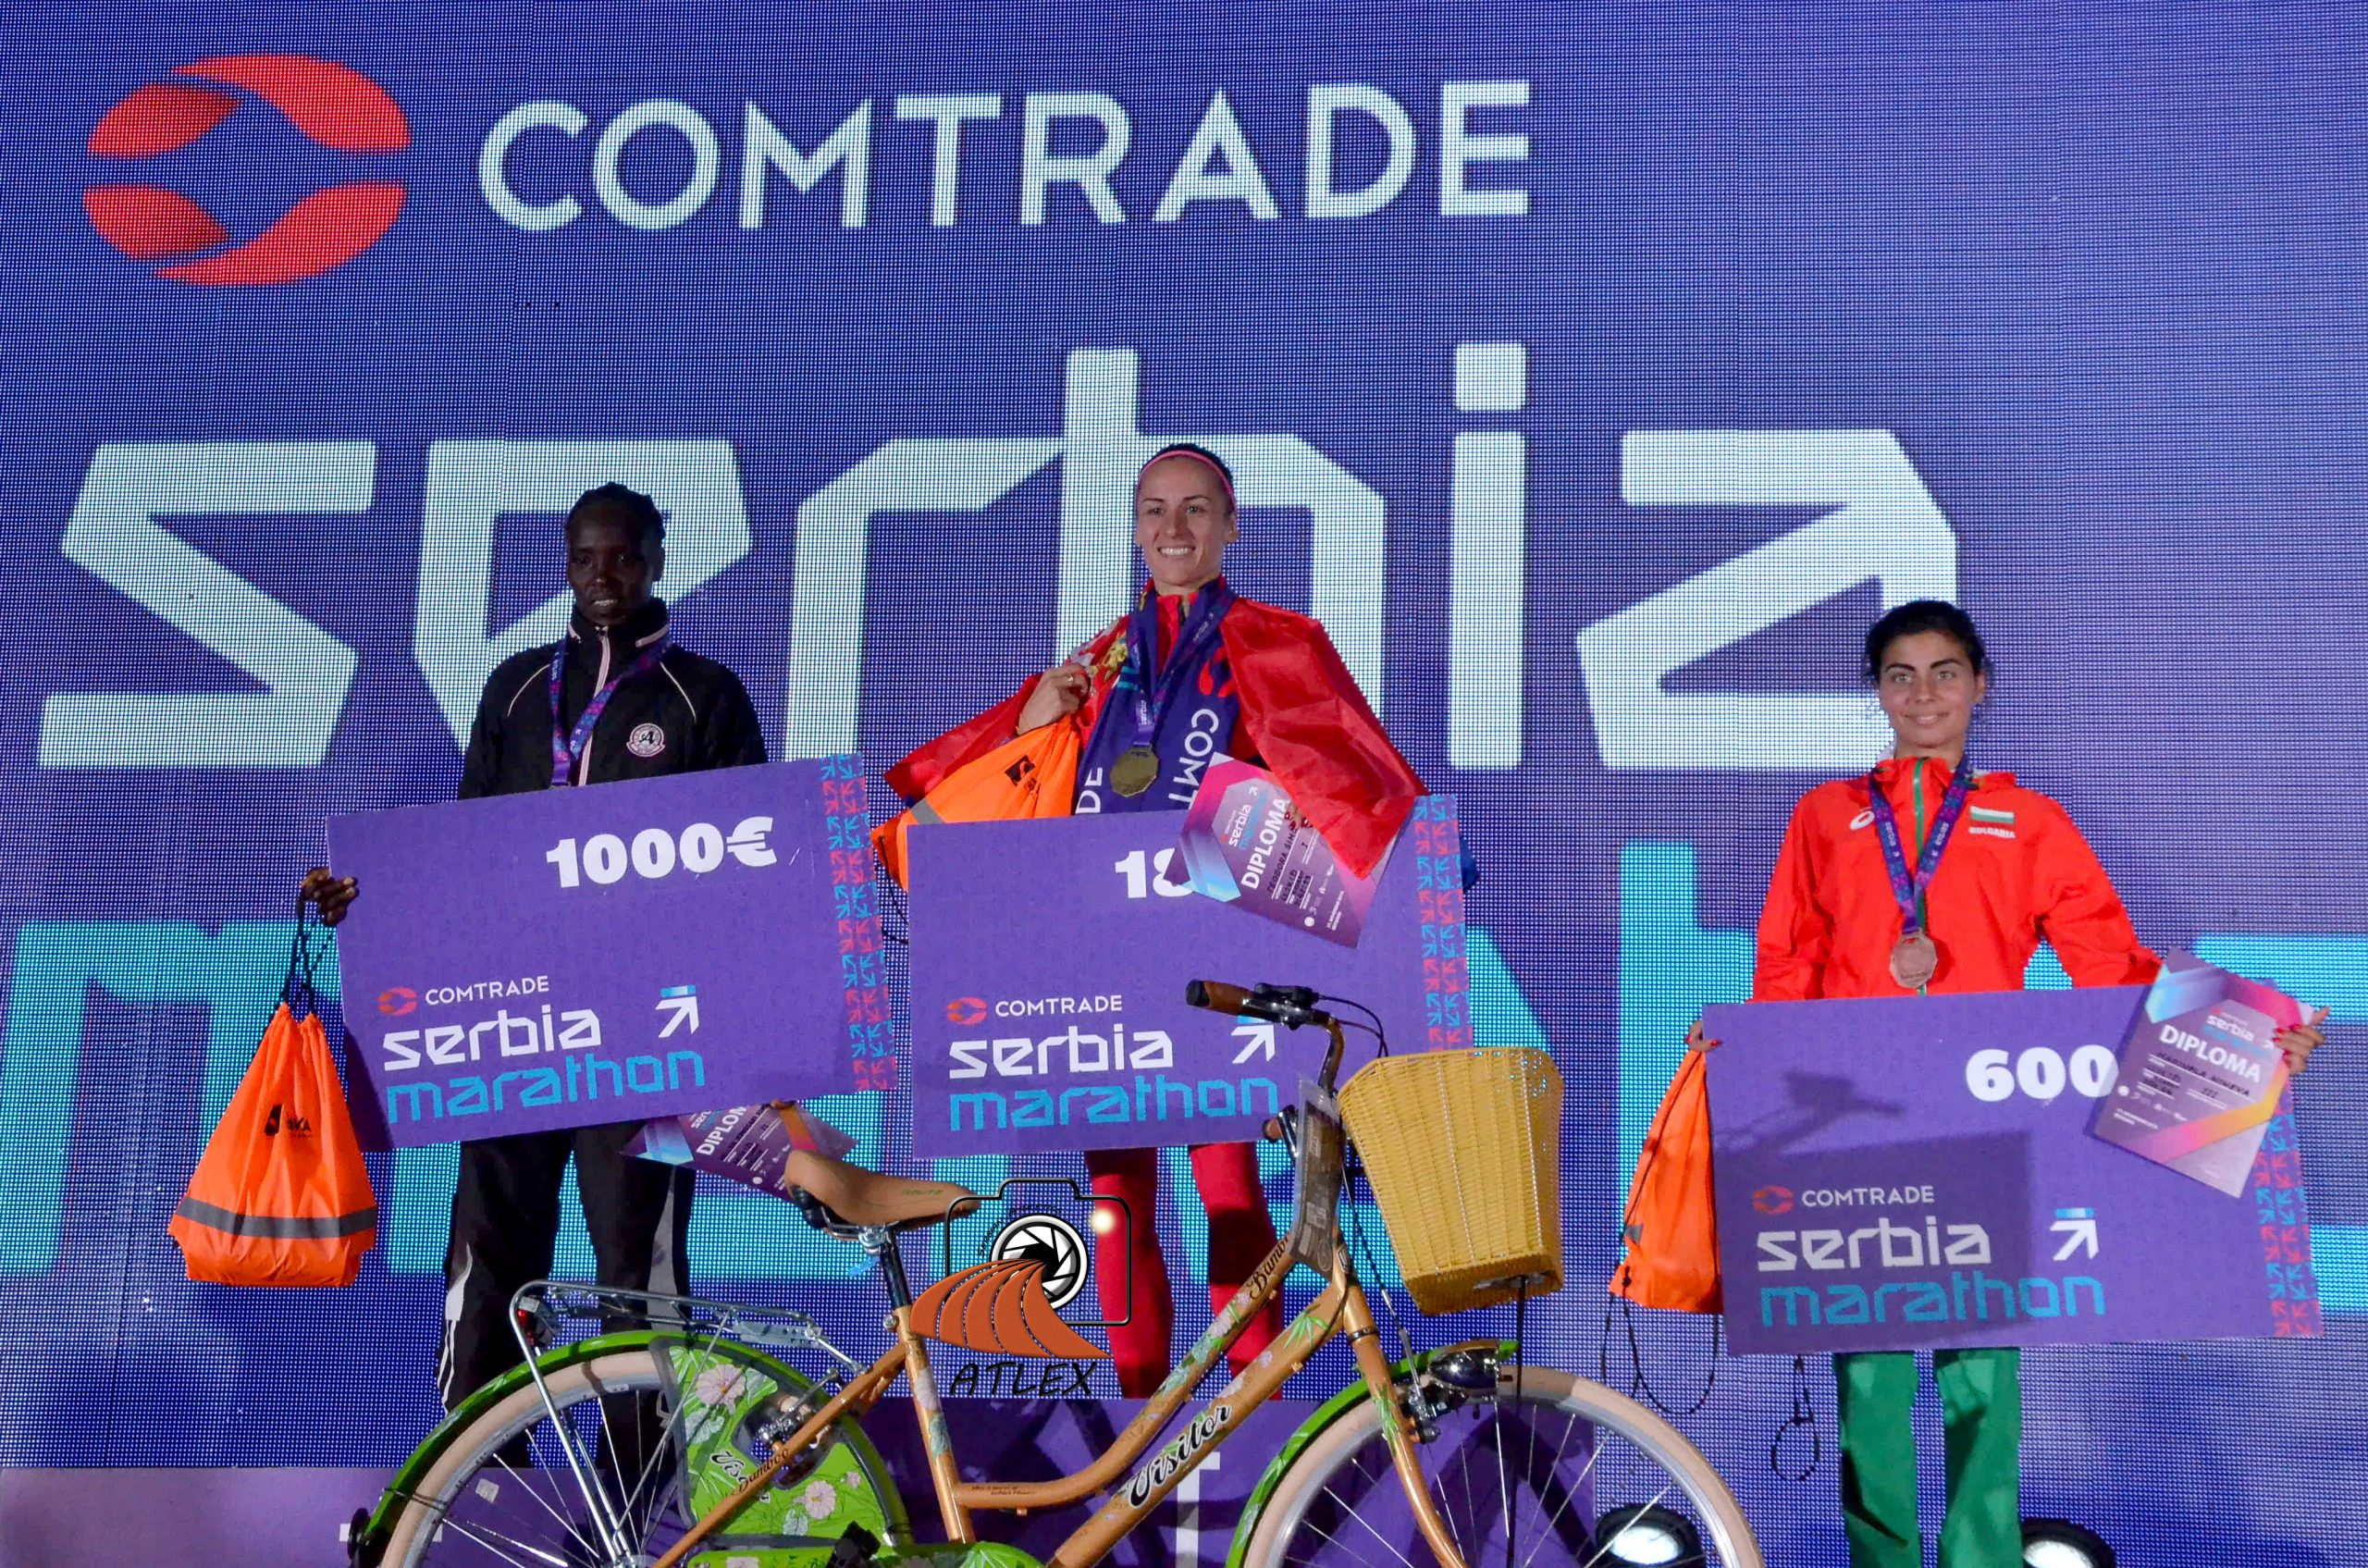 Prvi Comtrade Serbia Marathon, šampionke maratona, Helen Džepkosegej Kimutai, Teodora Simović, Marinela Nineva